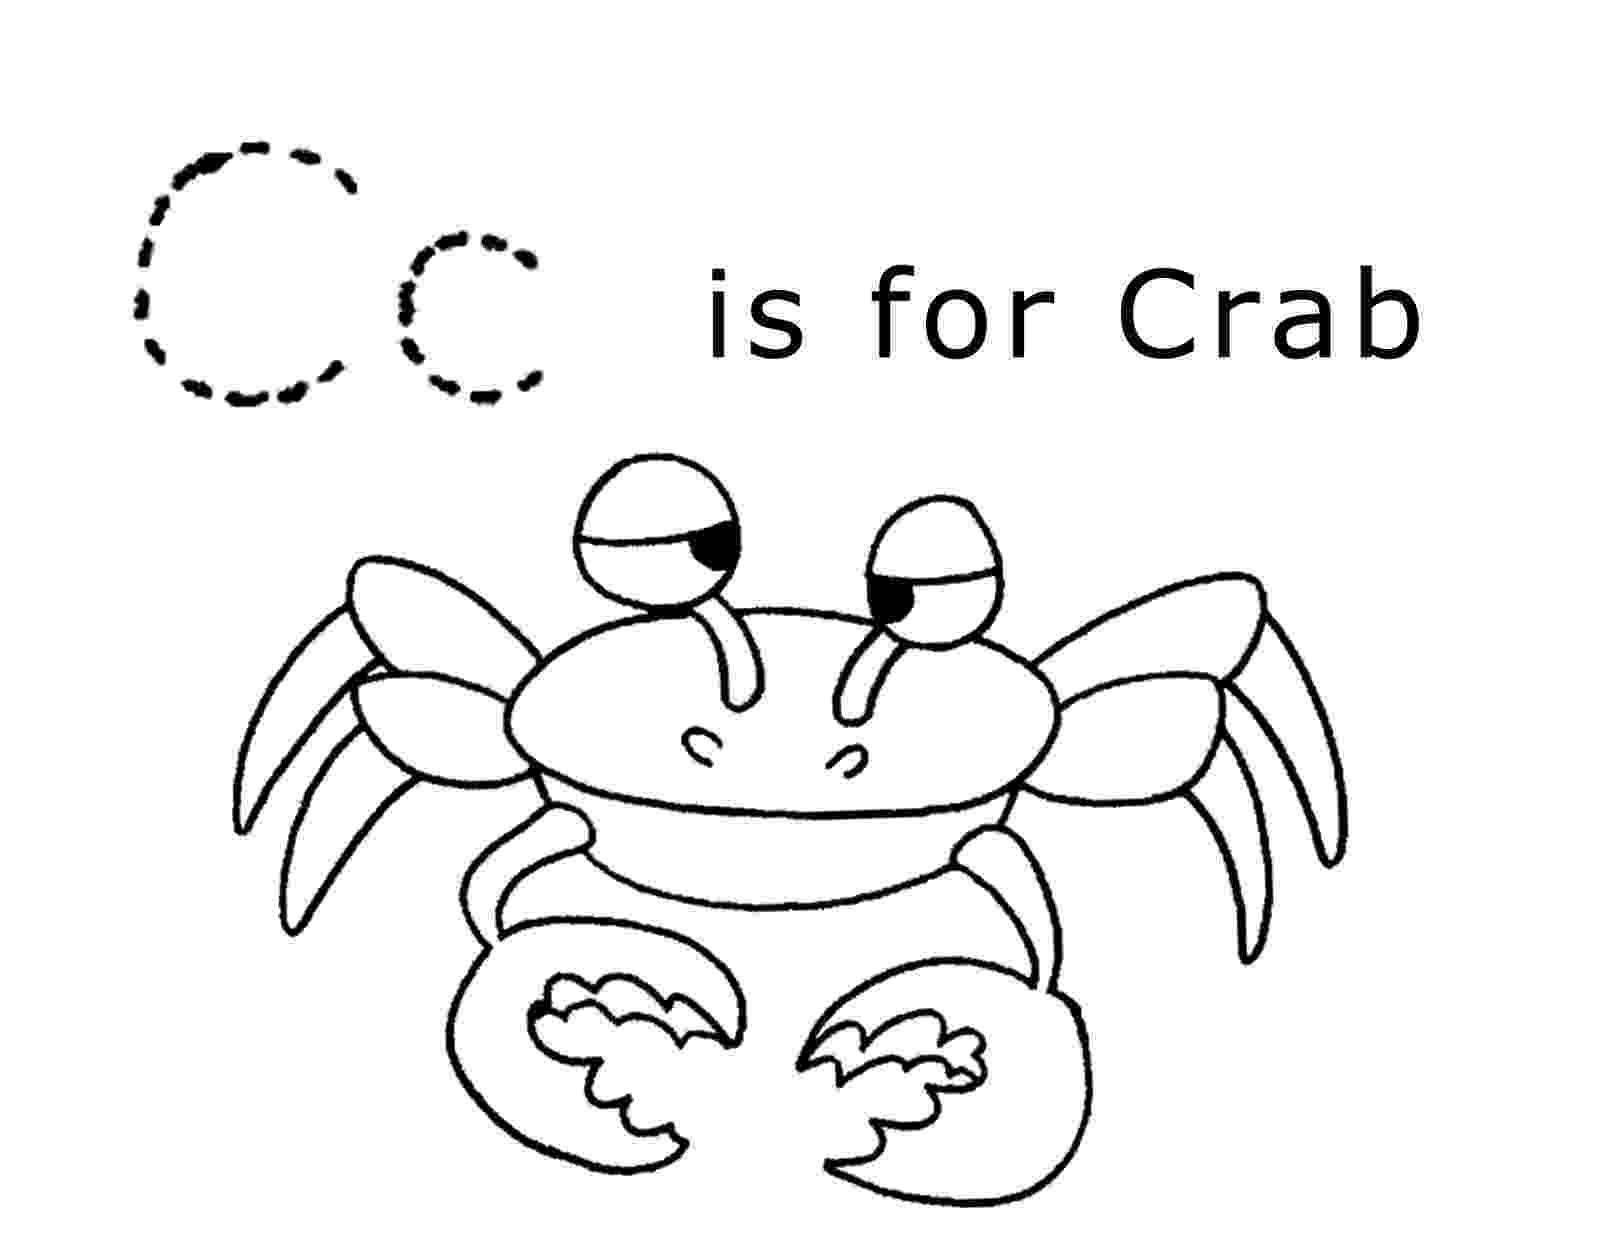 letter c coloring page letter c coloring pages getcoloringpagescom coloring c page letter